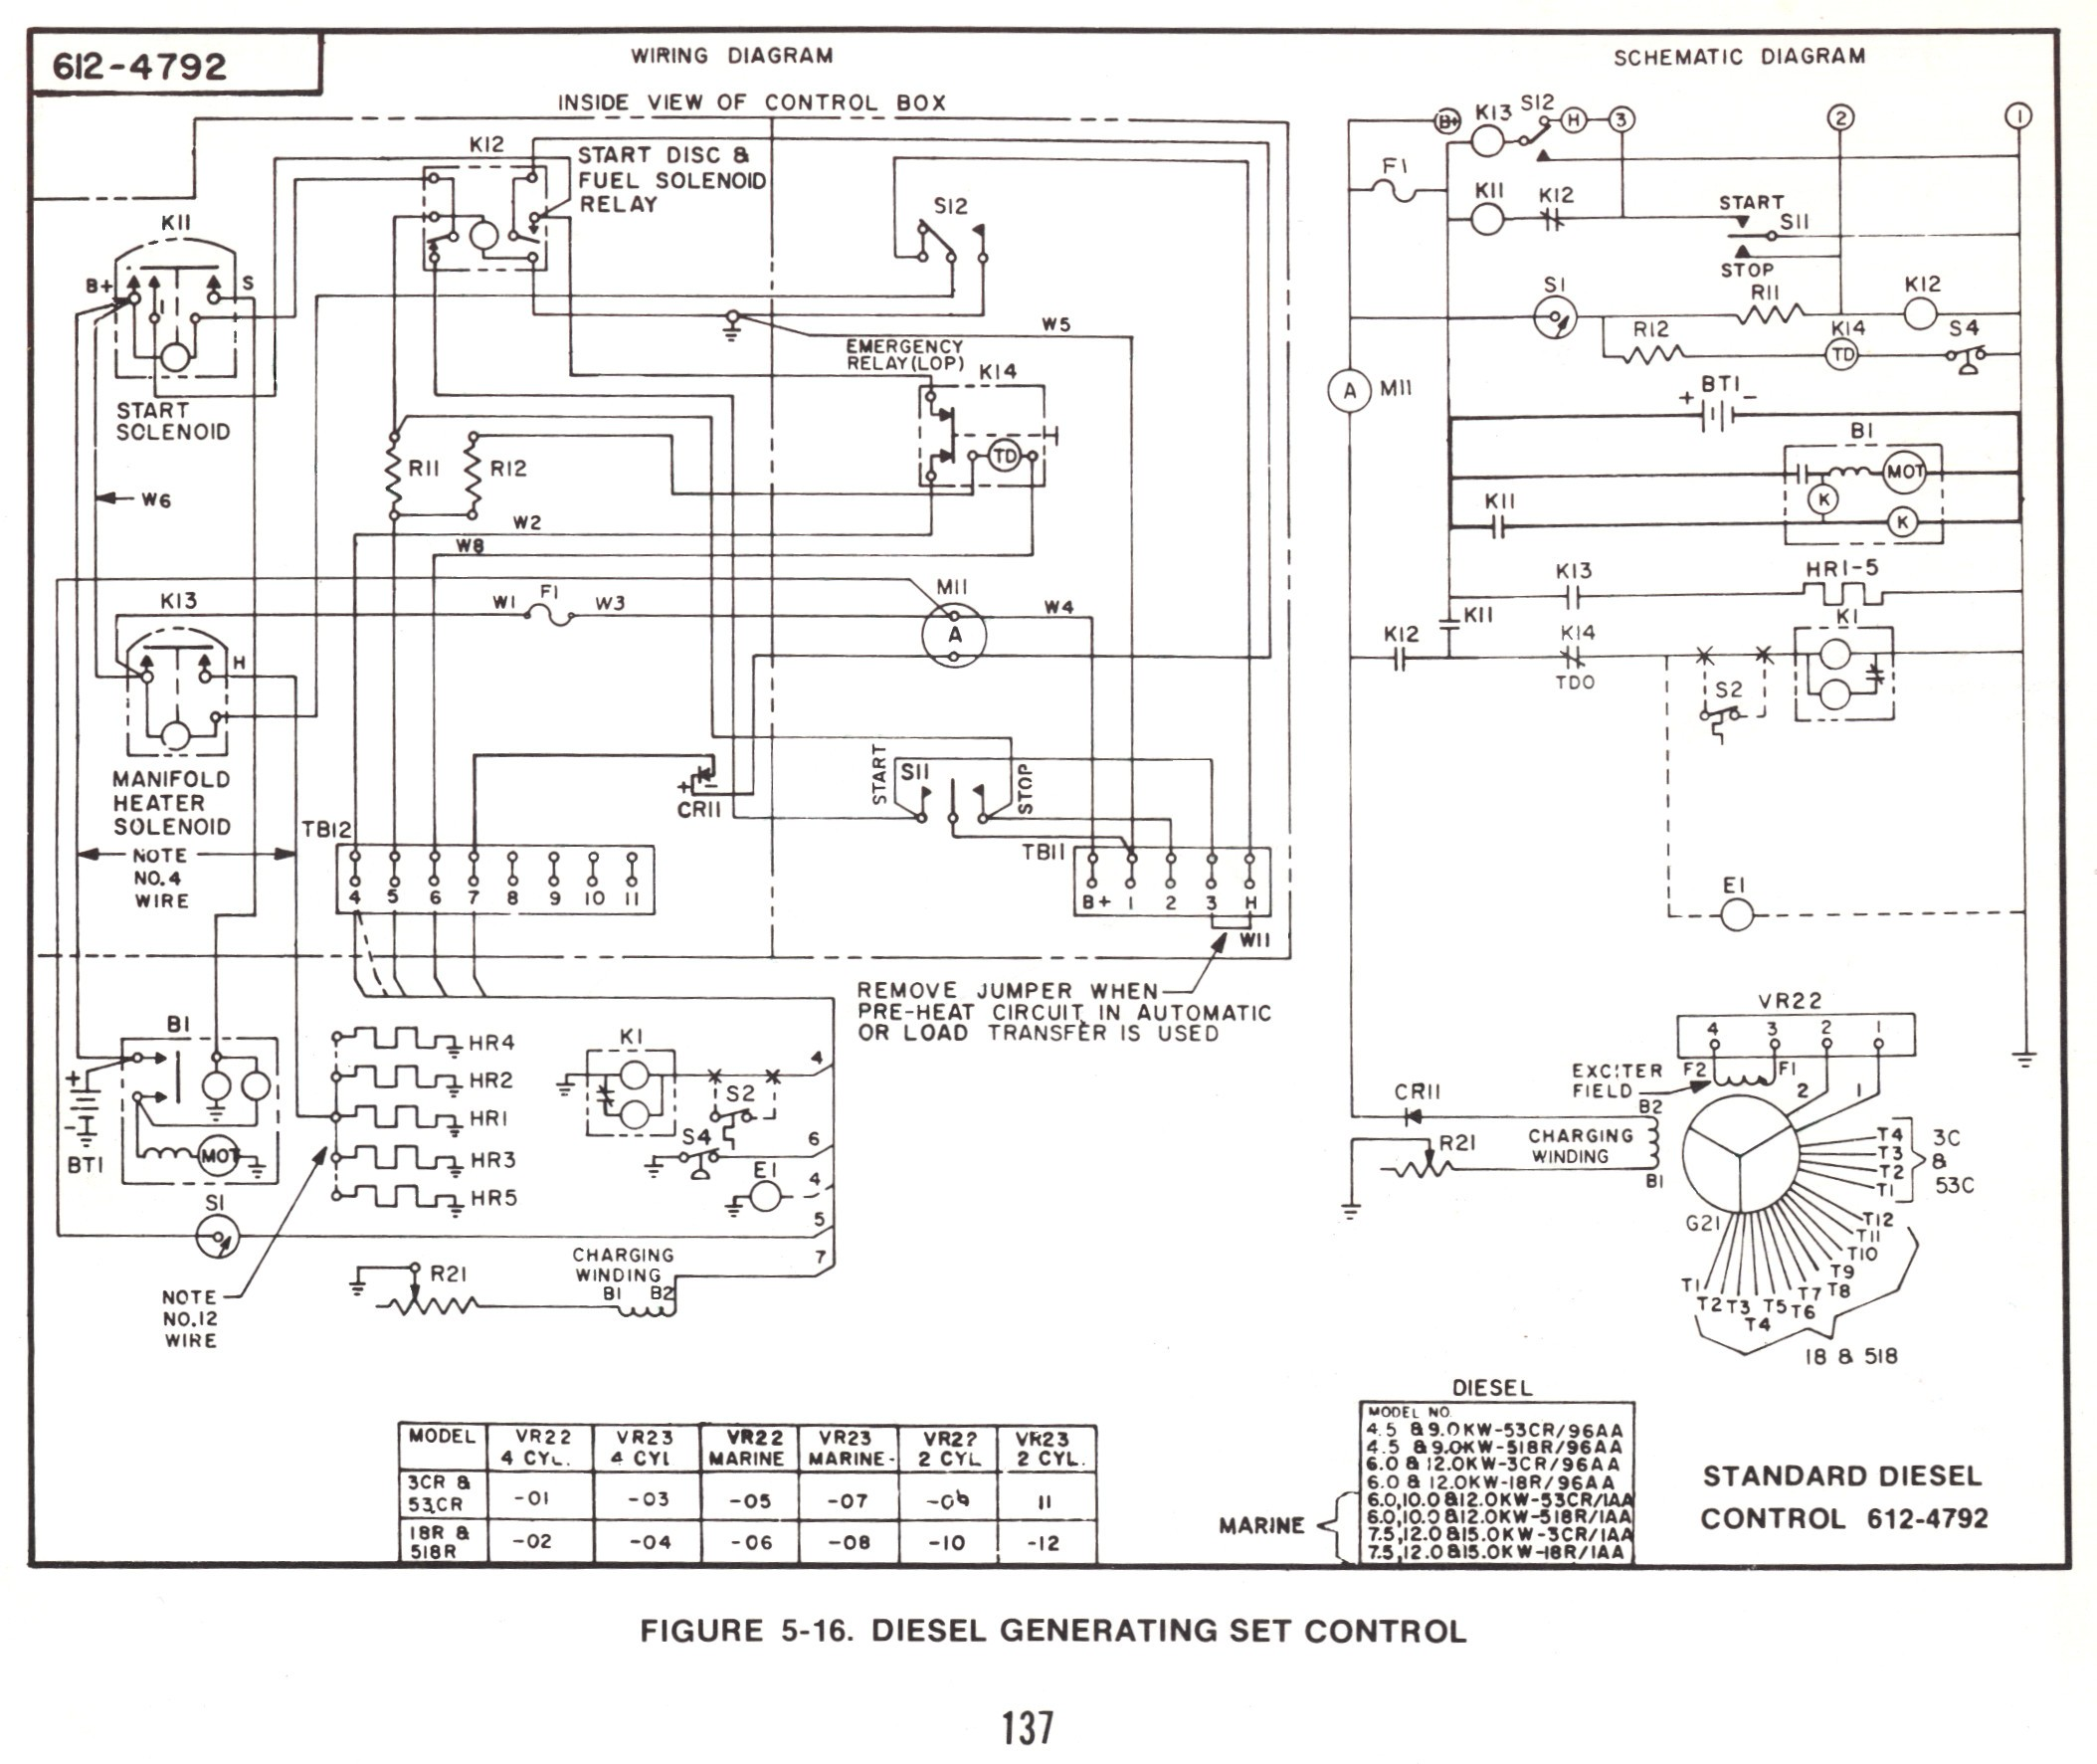 Wiring Diagram an Generator Save An Emerald 1 Genset Wiring Diagram An Generator Emerald 1 Wiring